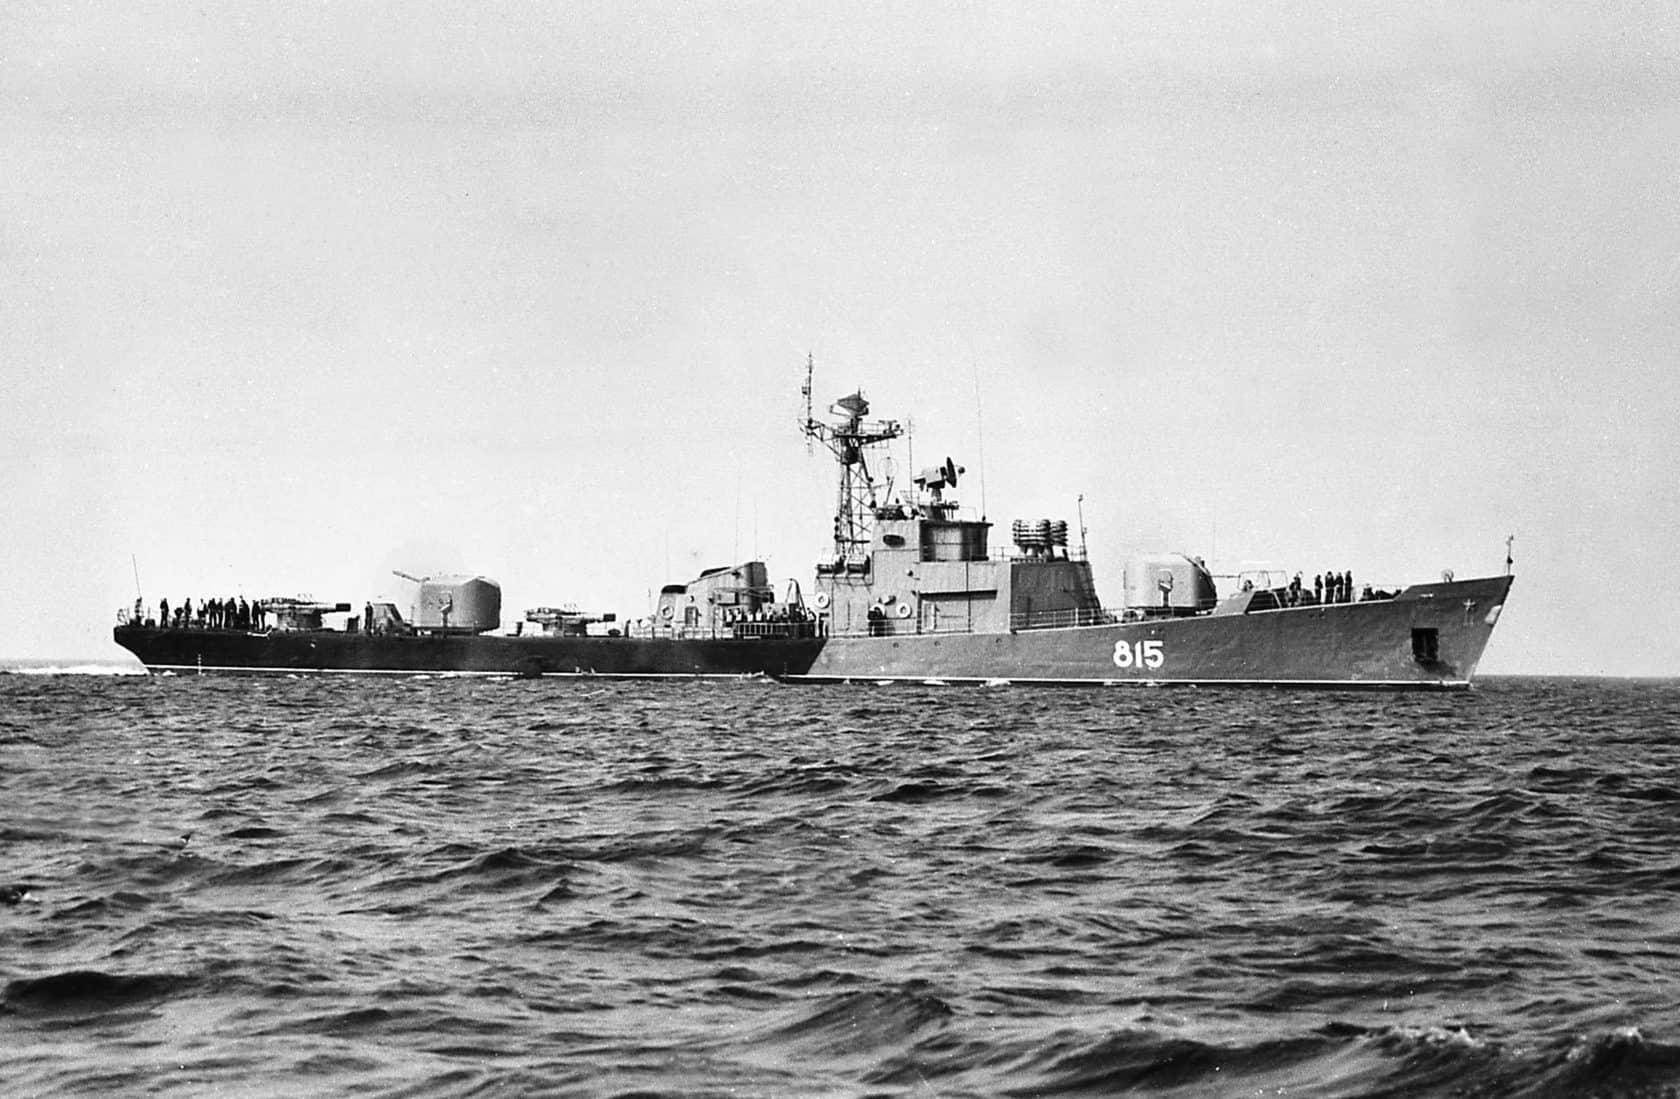 СКР-112 (815)